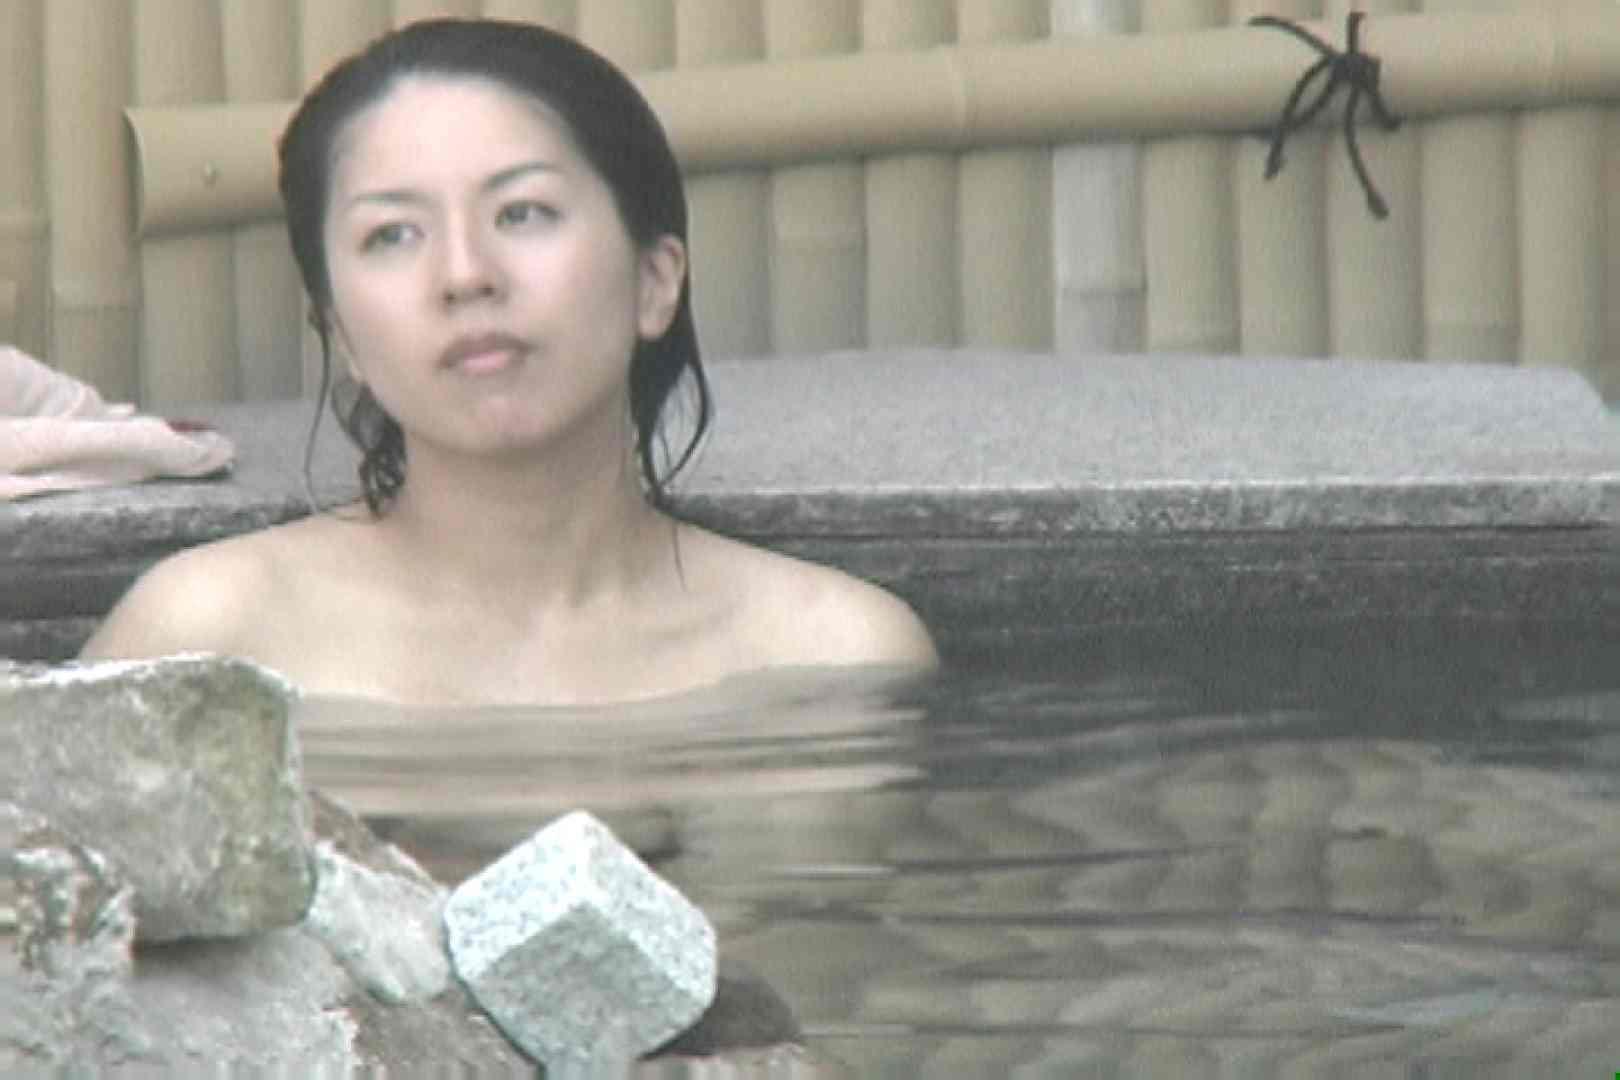 Aquaな露天風呂Vol.694 露天 オメコ無修正動画無料 110PICs 2